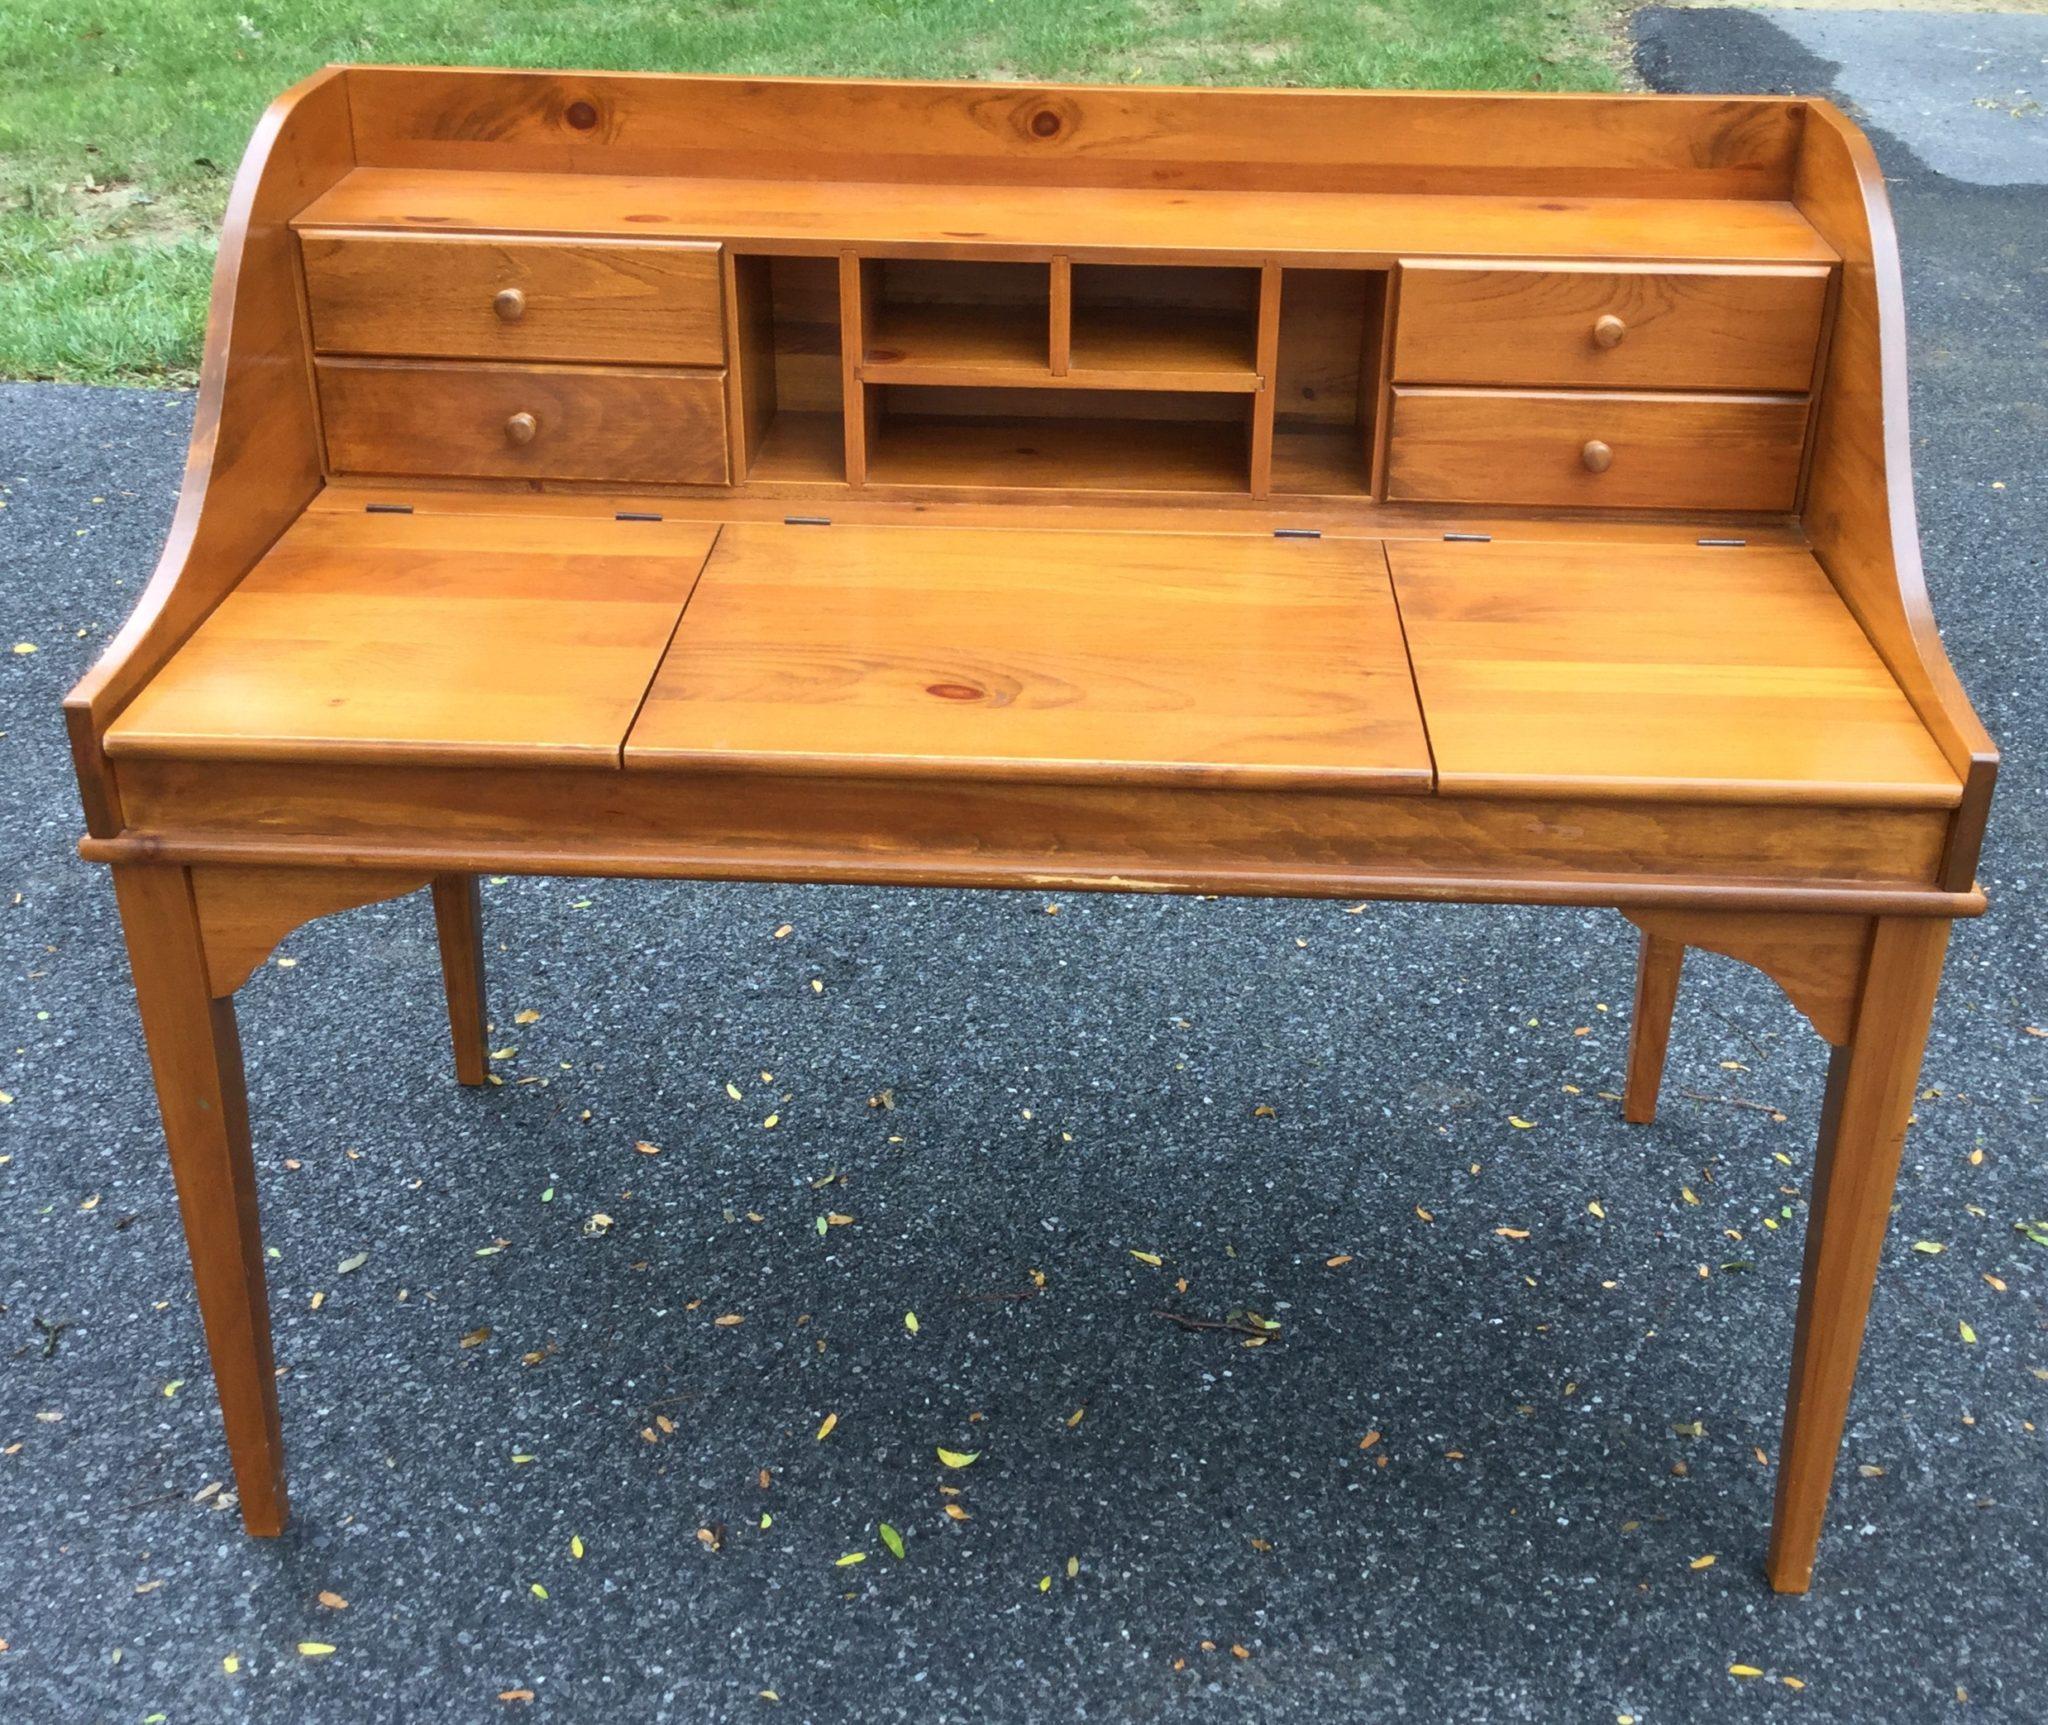 100 furniture consignment furniture orange county wallflower u0027s furniture huntington beach - Home office furniture orange county ca ...